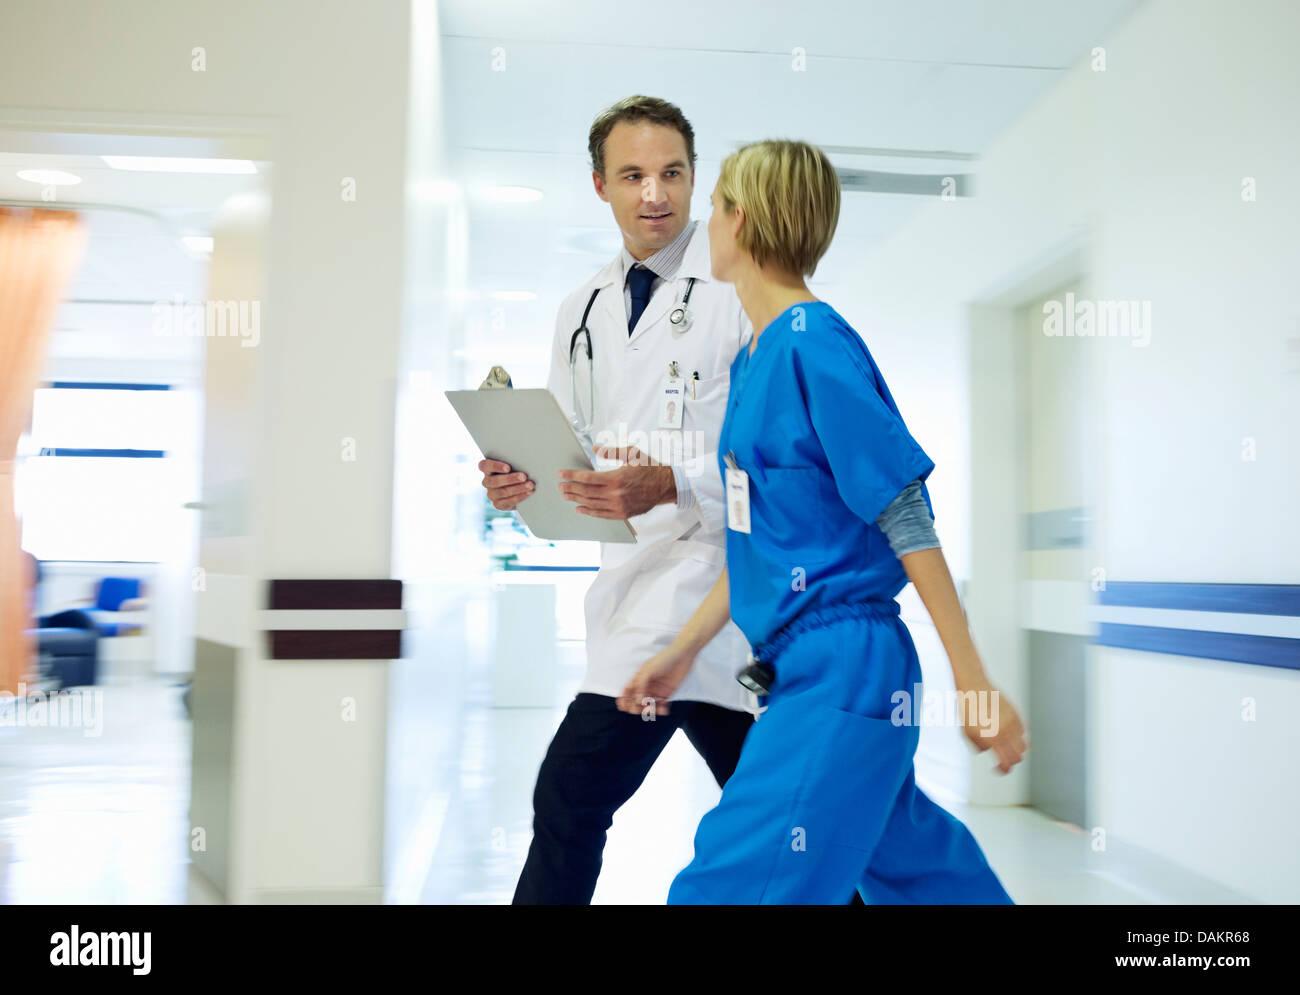 Doctor and nurse walking in hospital hallway - Stock Image